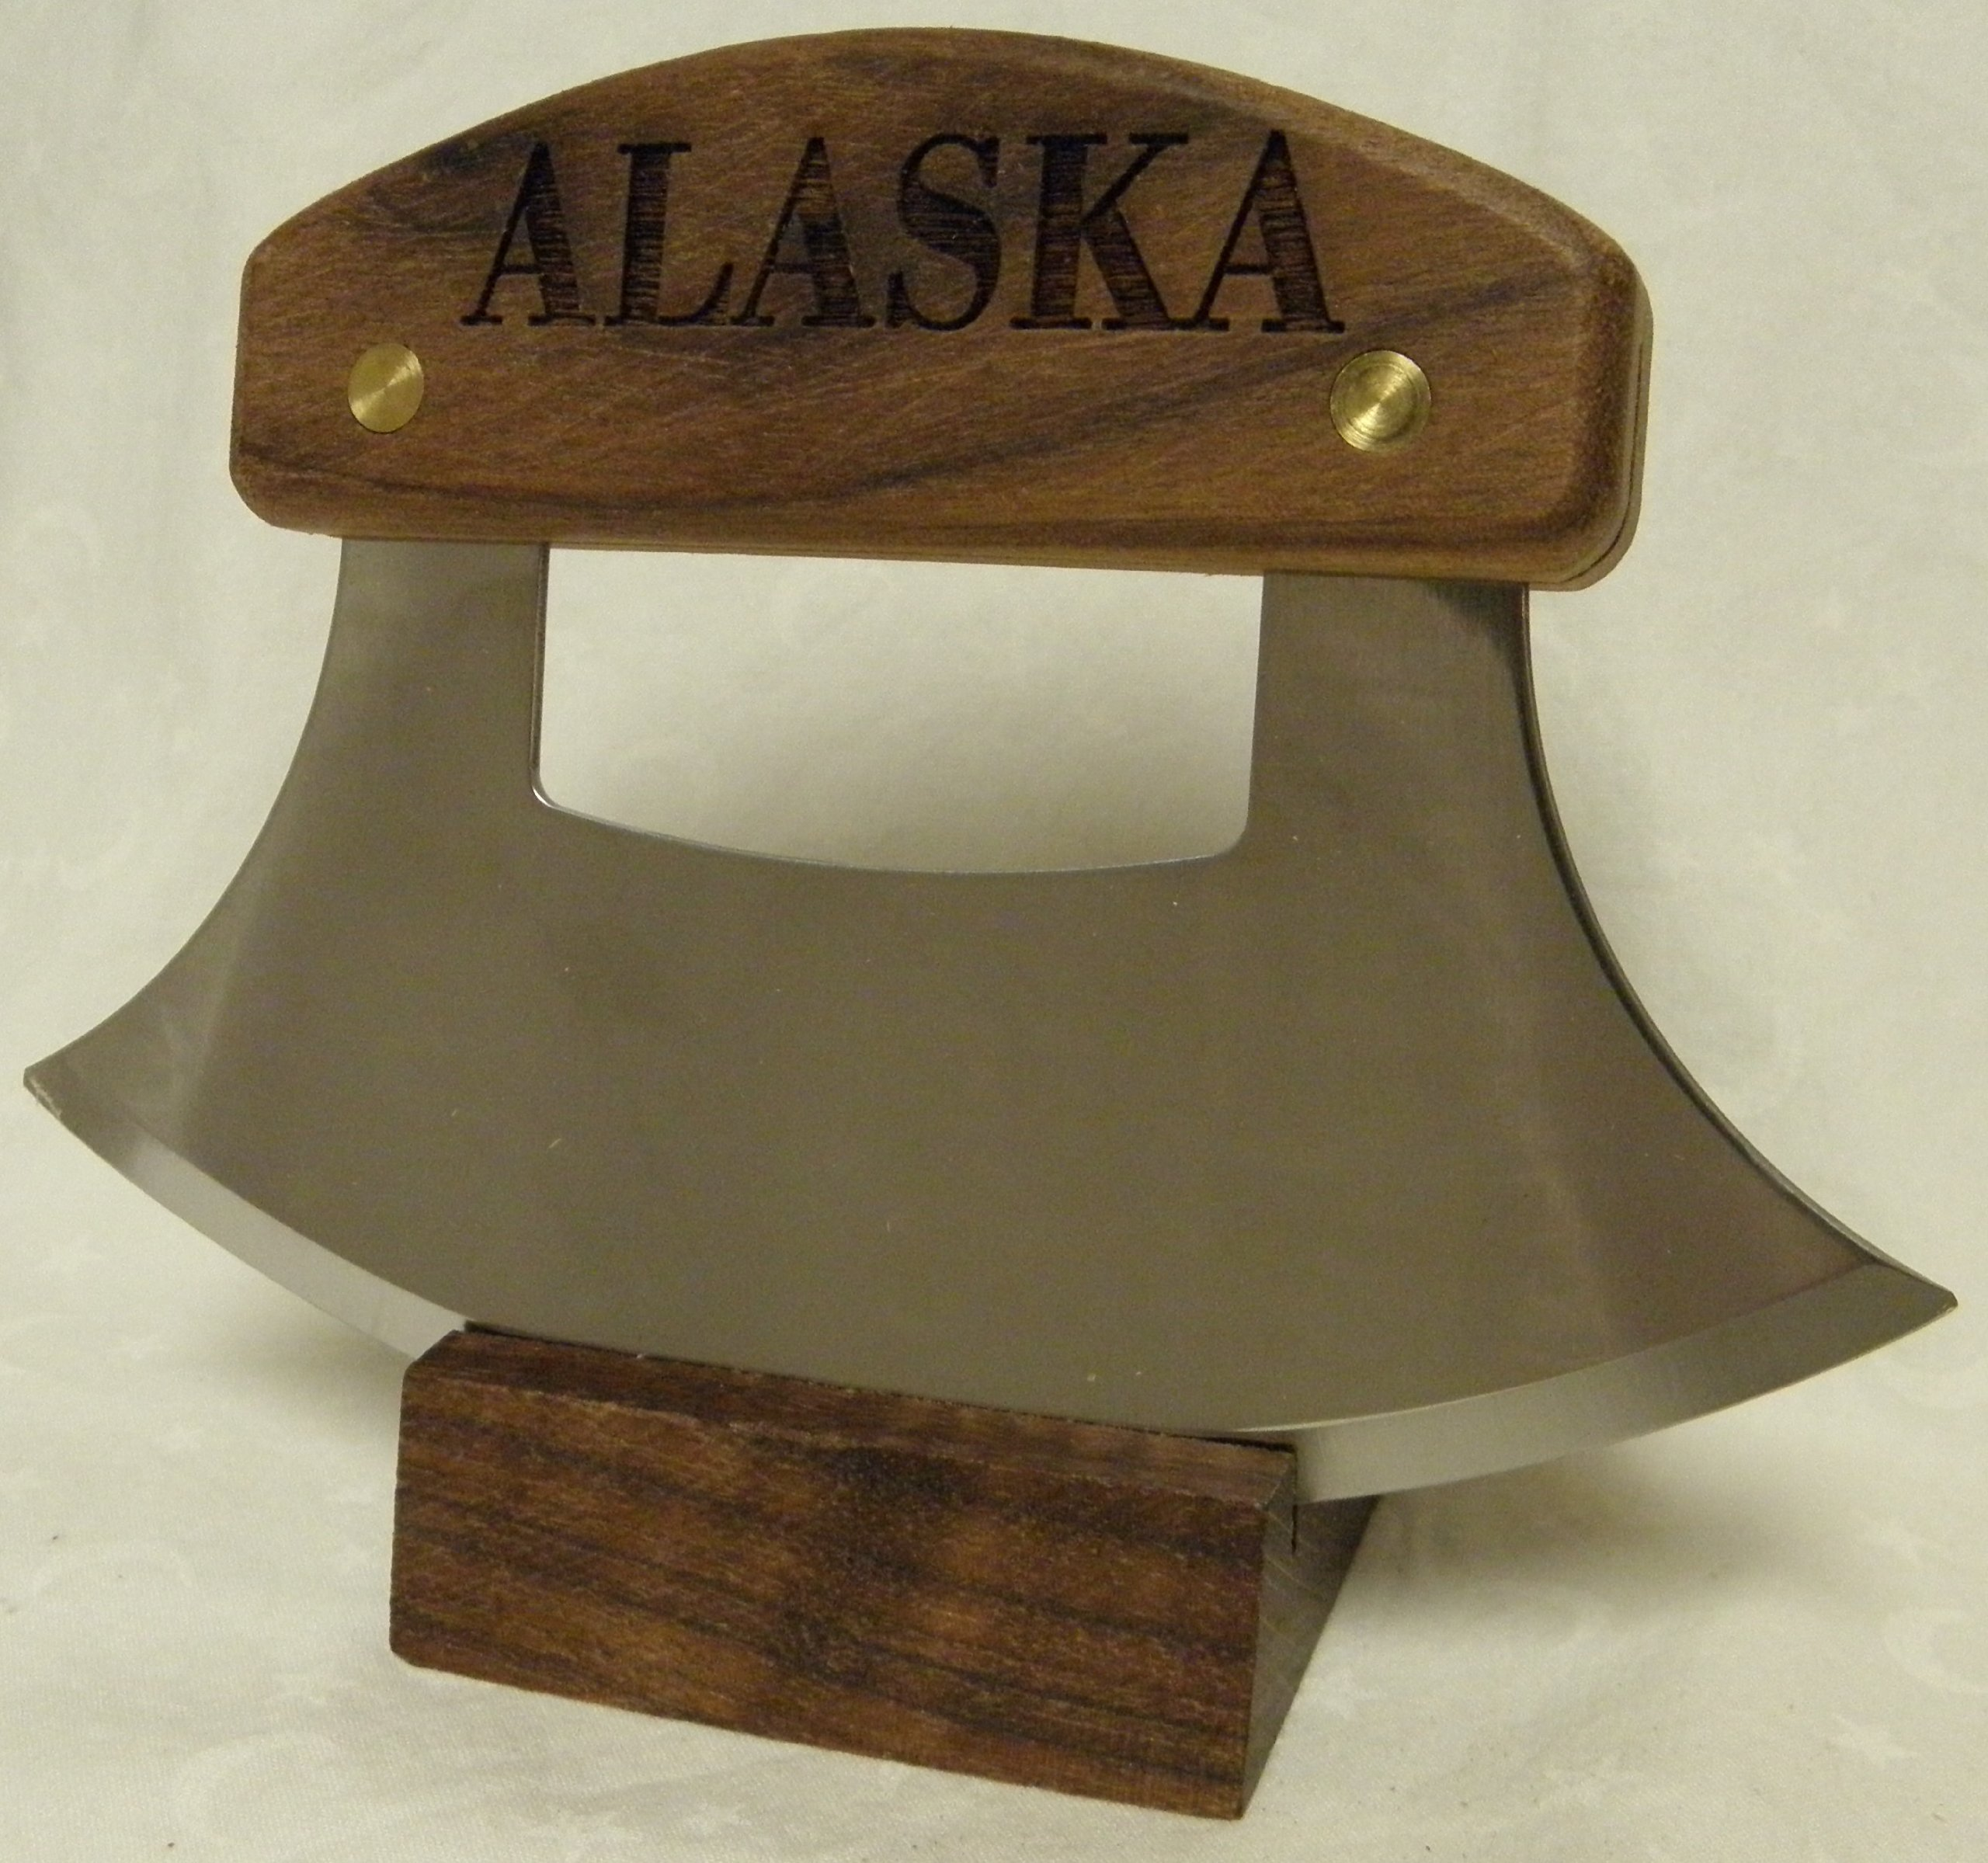 Alaskan Ulu, Inupiat Style with ''Alaska'' Etched Walnut Handle, 6''